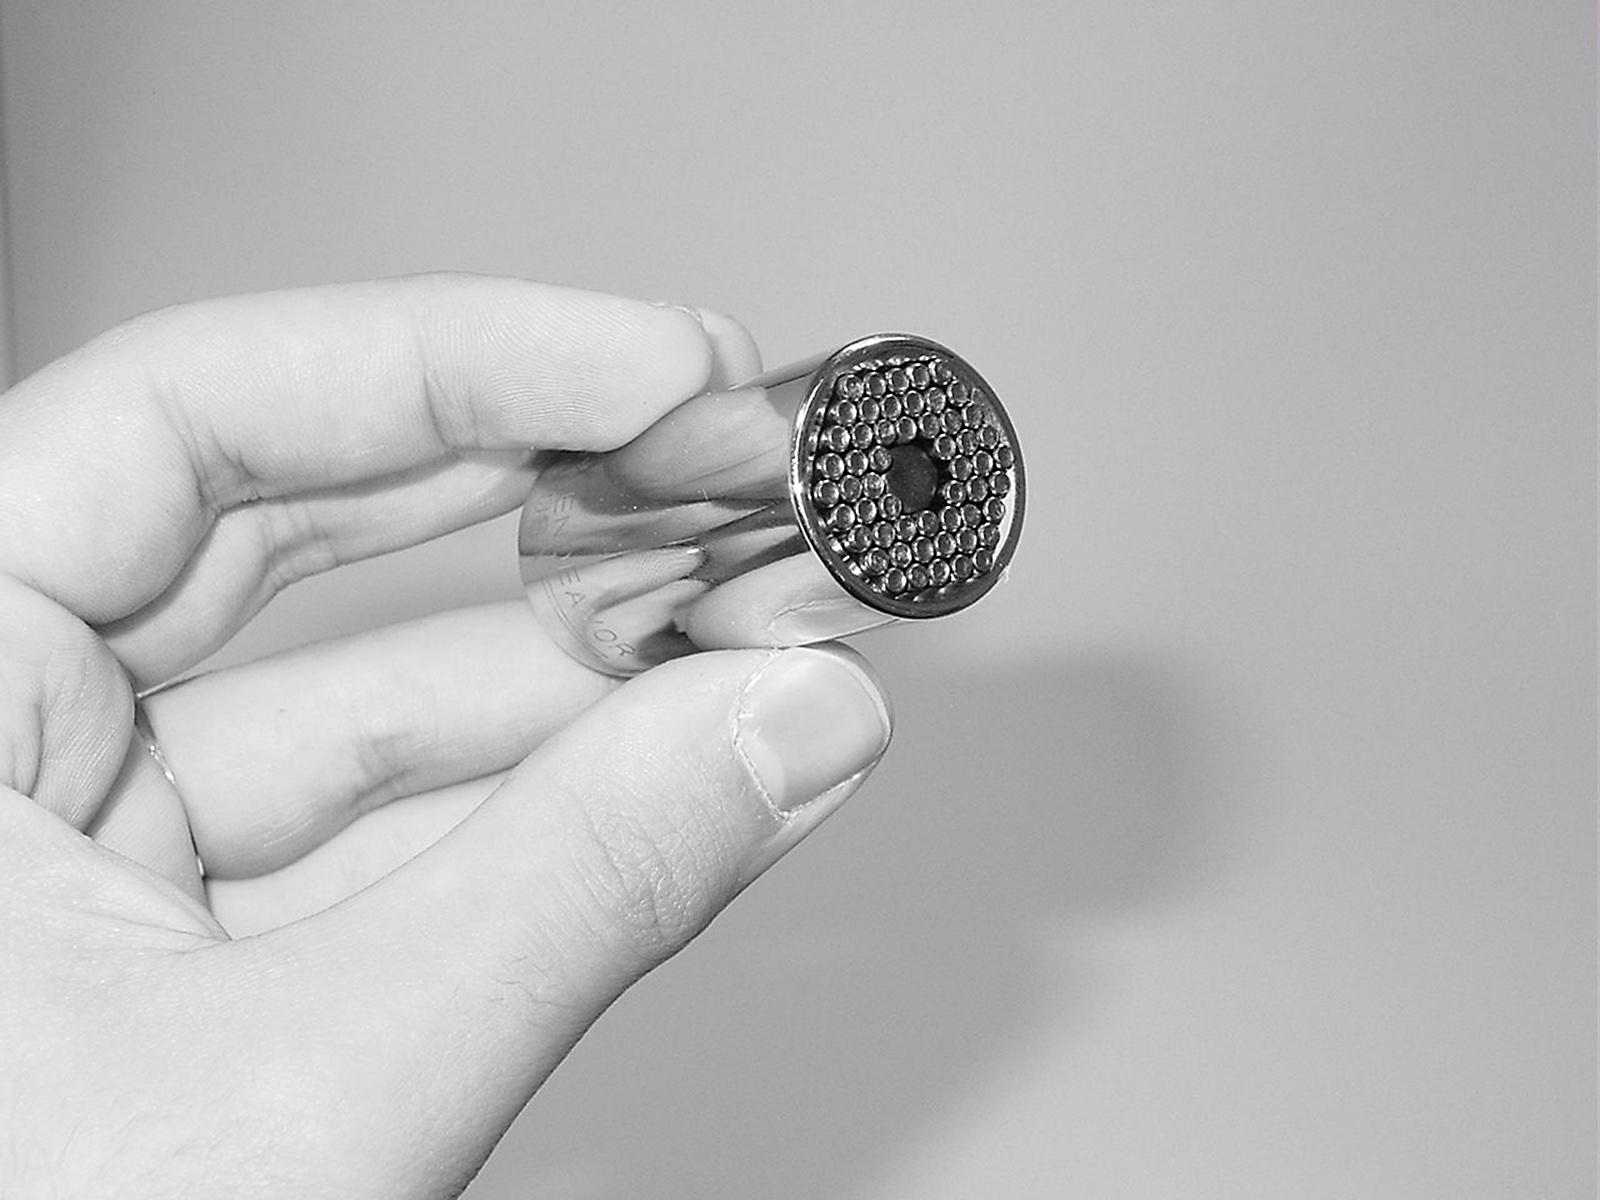 Gator Grips Universal Socket, 1 socket